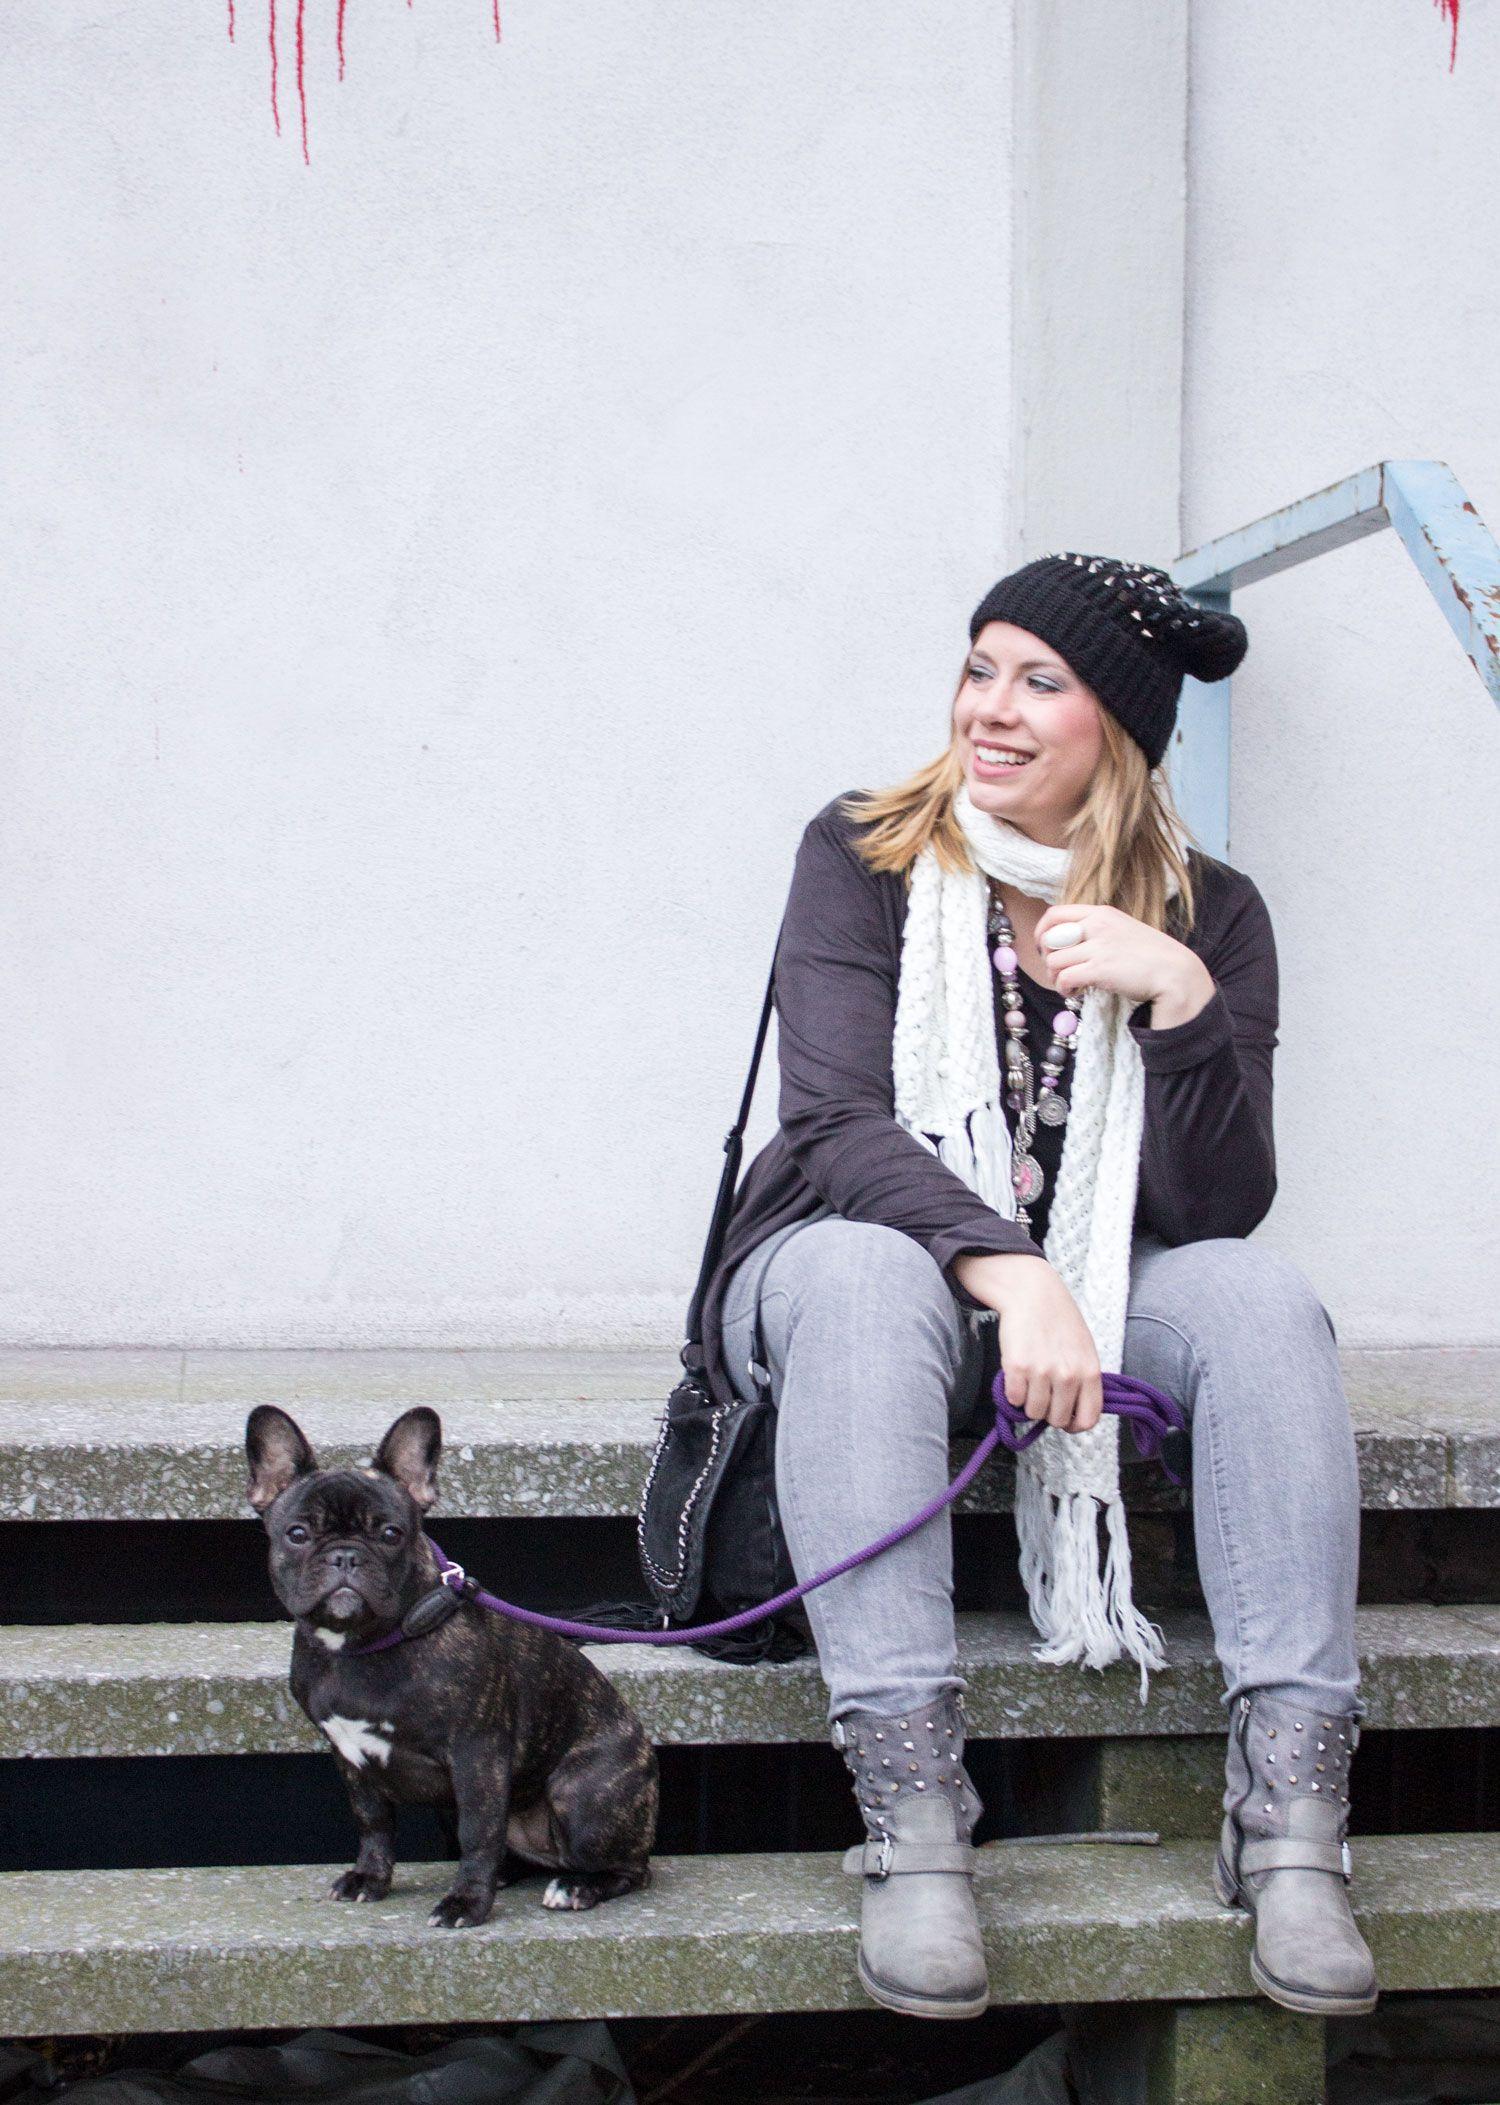 Streetstyle with Leather Fringe Jacket by Expresso Fashion